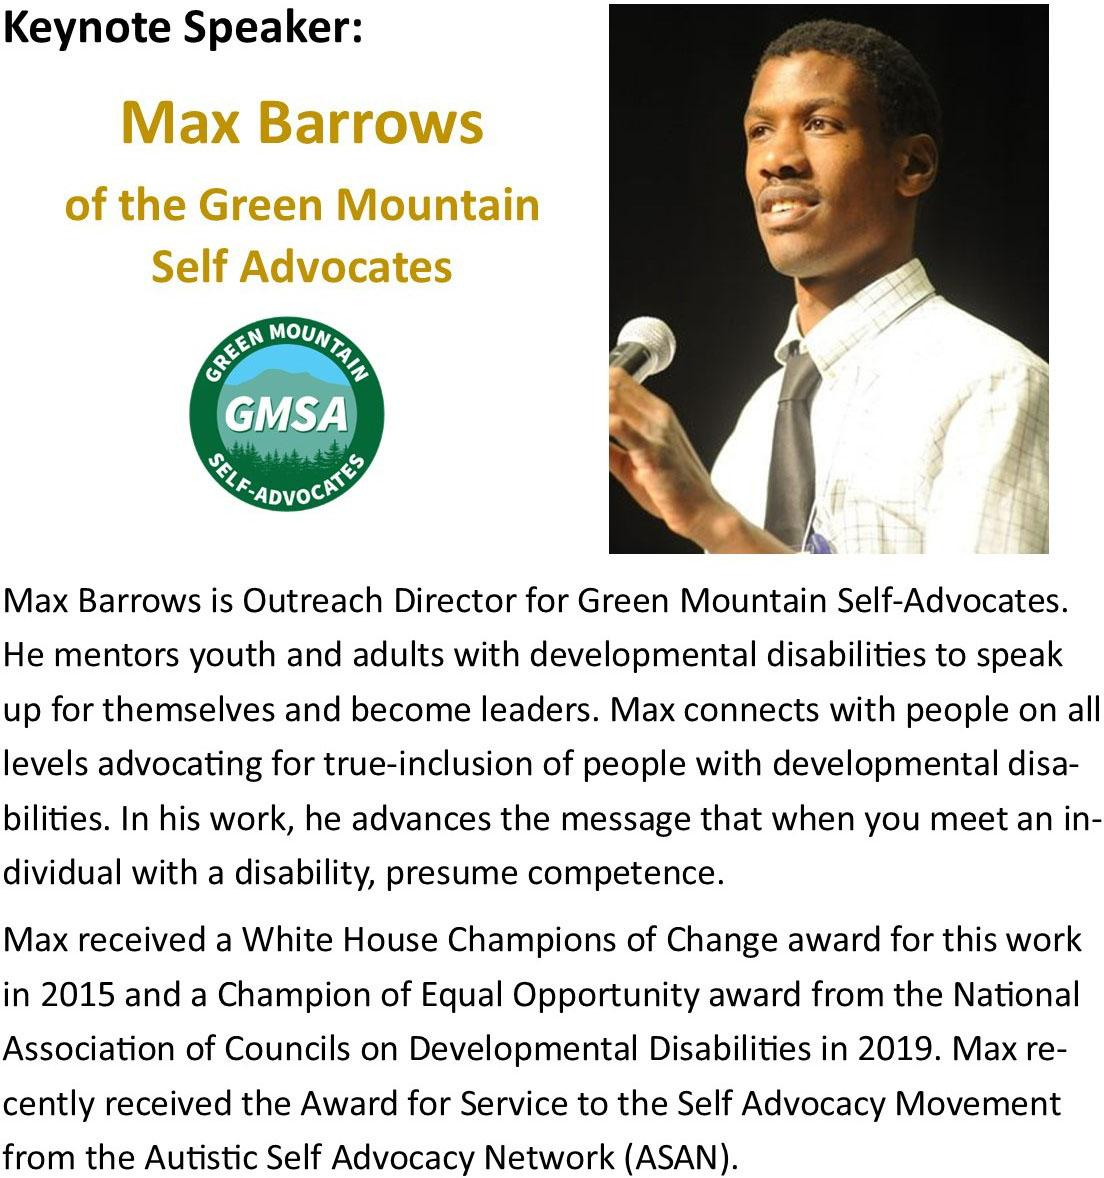 Max Barrows of Green Mountain Self advocates